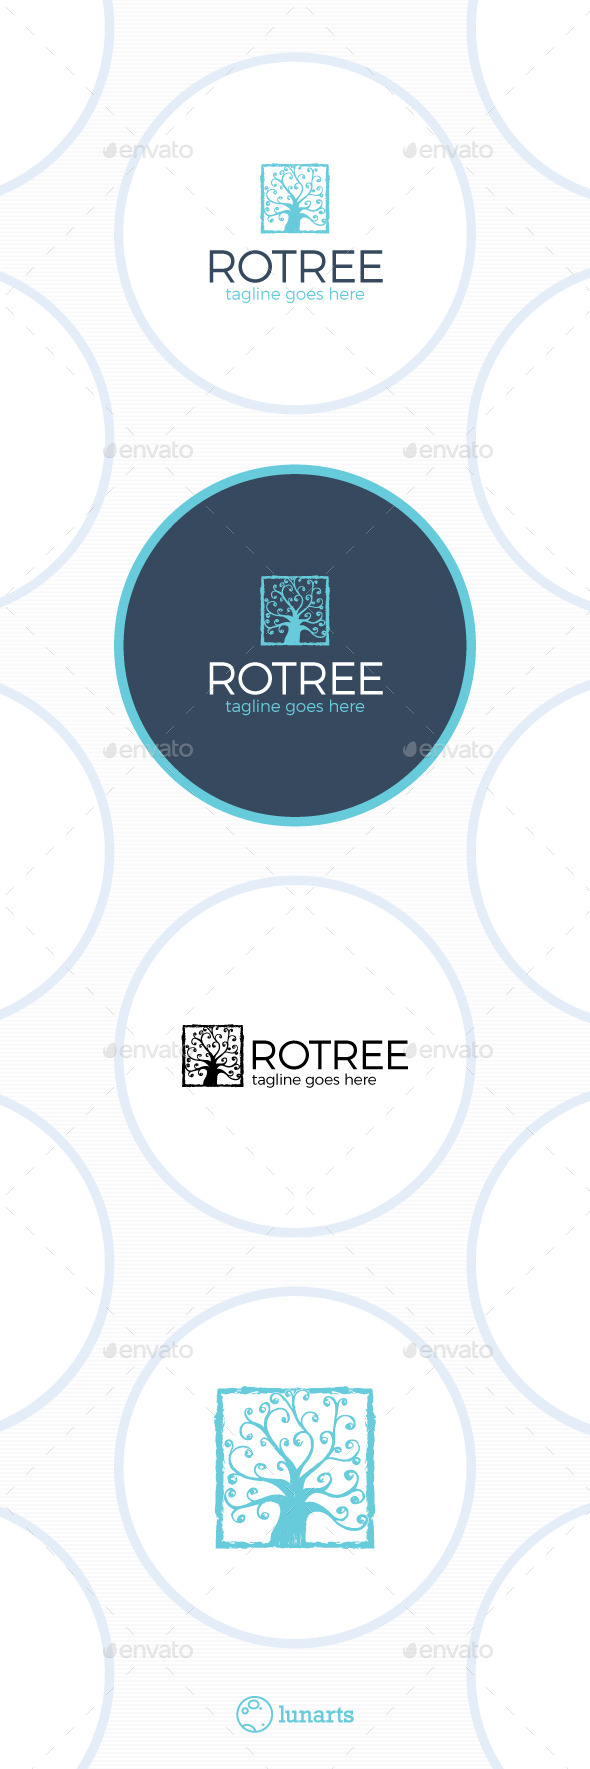 Royal Tree Logo - Luxury Square